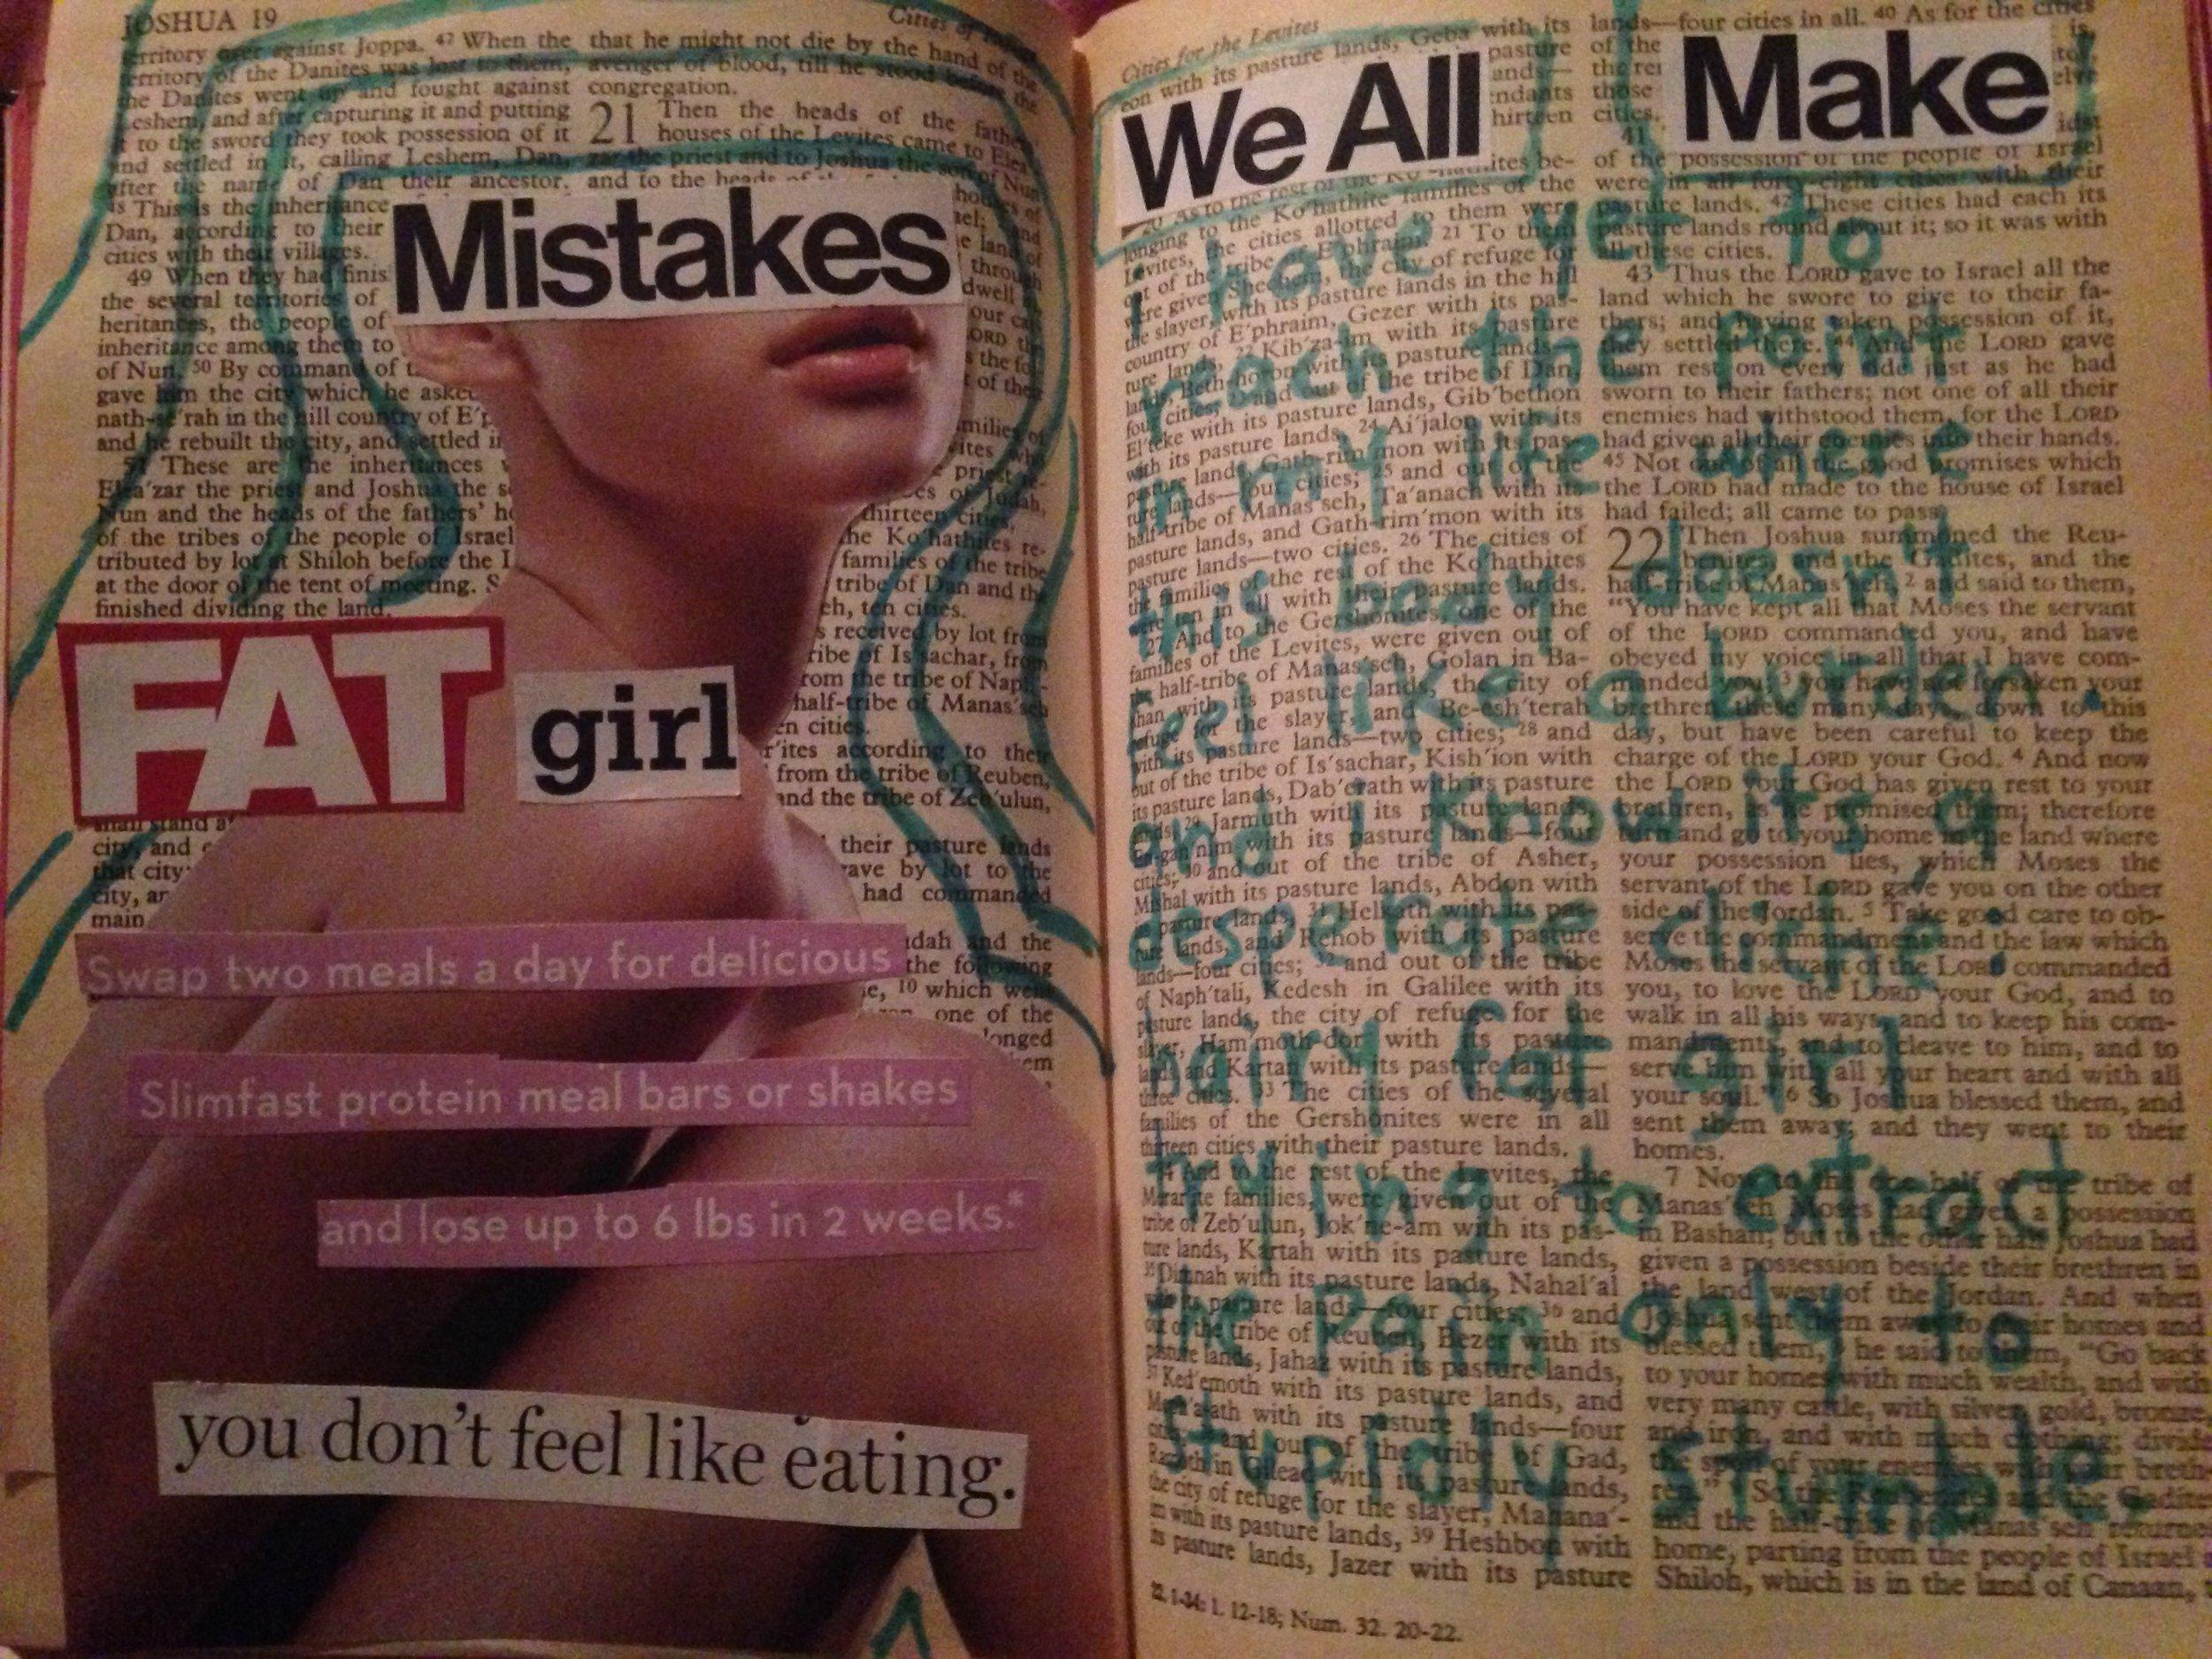 Erika Ruiz- Mistakes We All Make